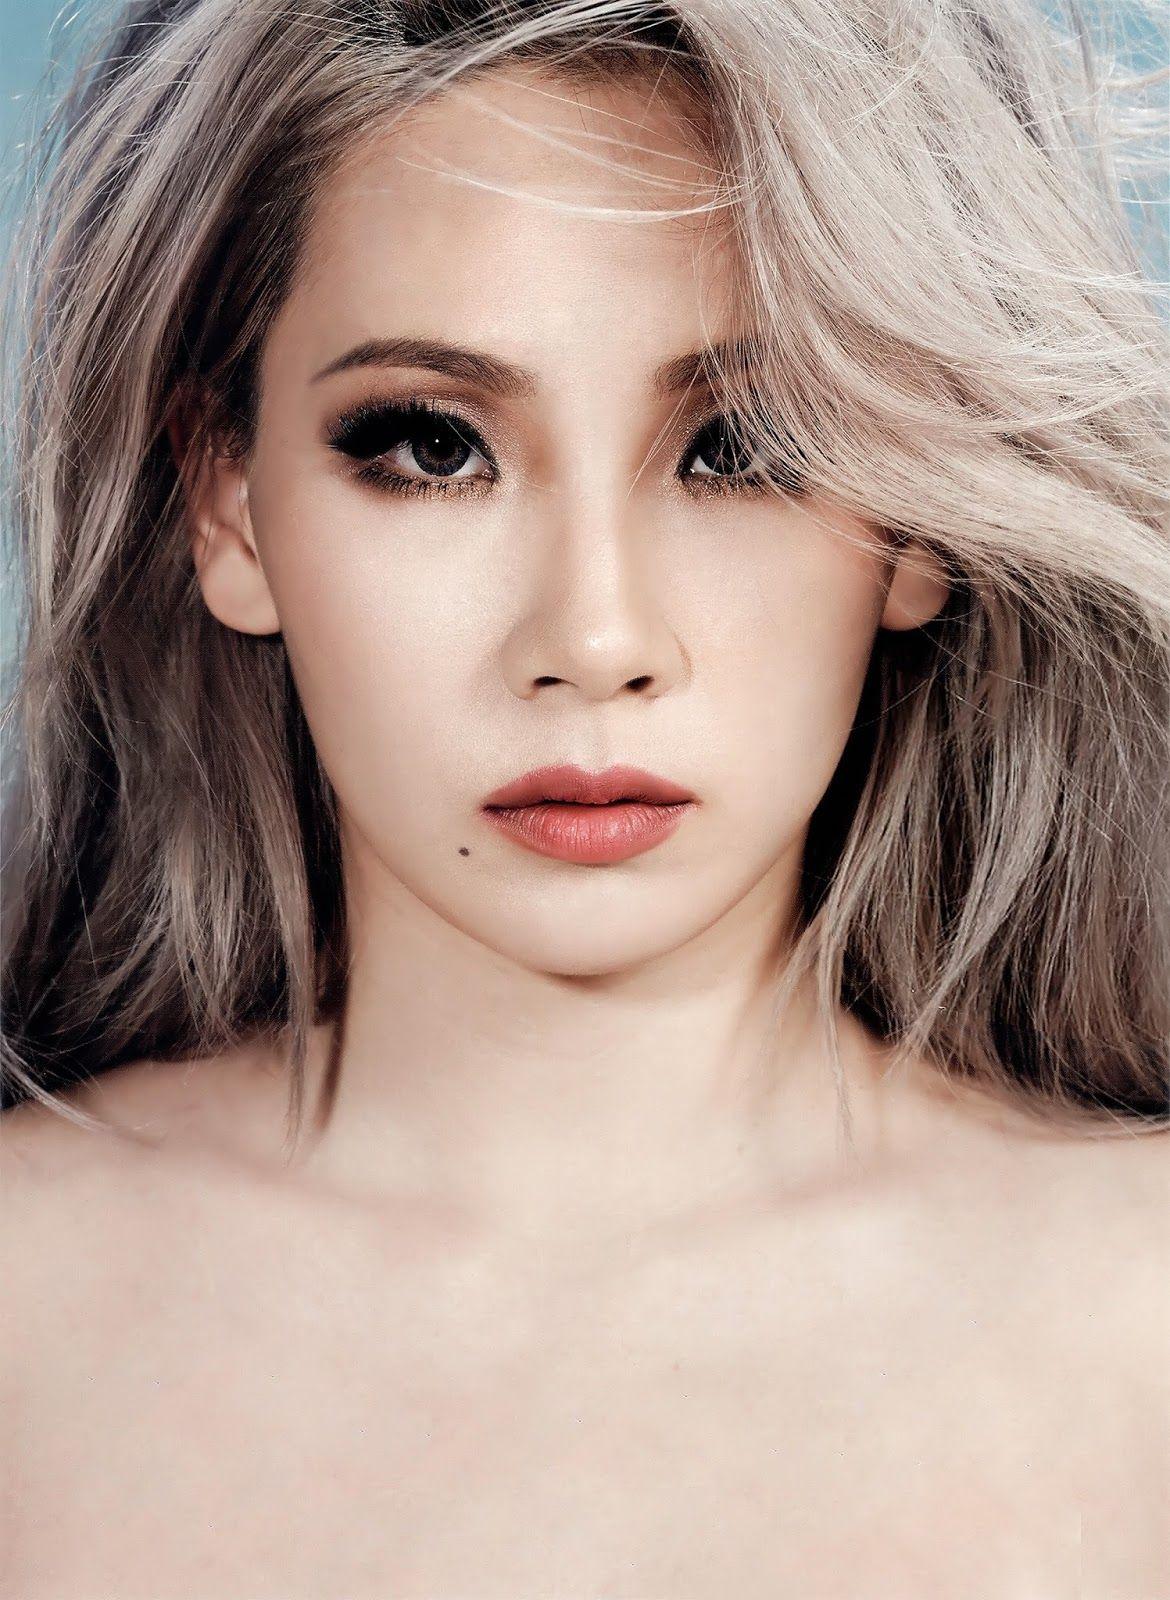 [K-POP PHOTOS] 2ne1s CL for InStyle Korea Magazne September Issue   2ne1, Pop photos, Cl 2ne1